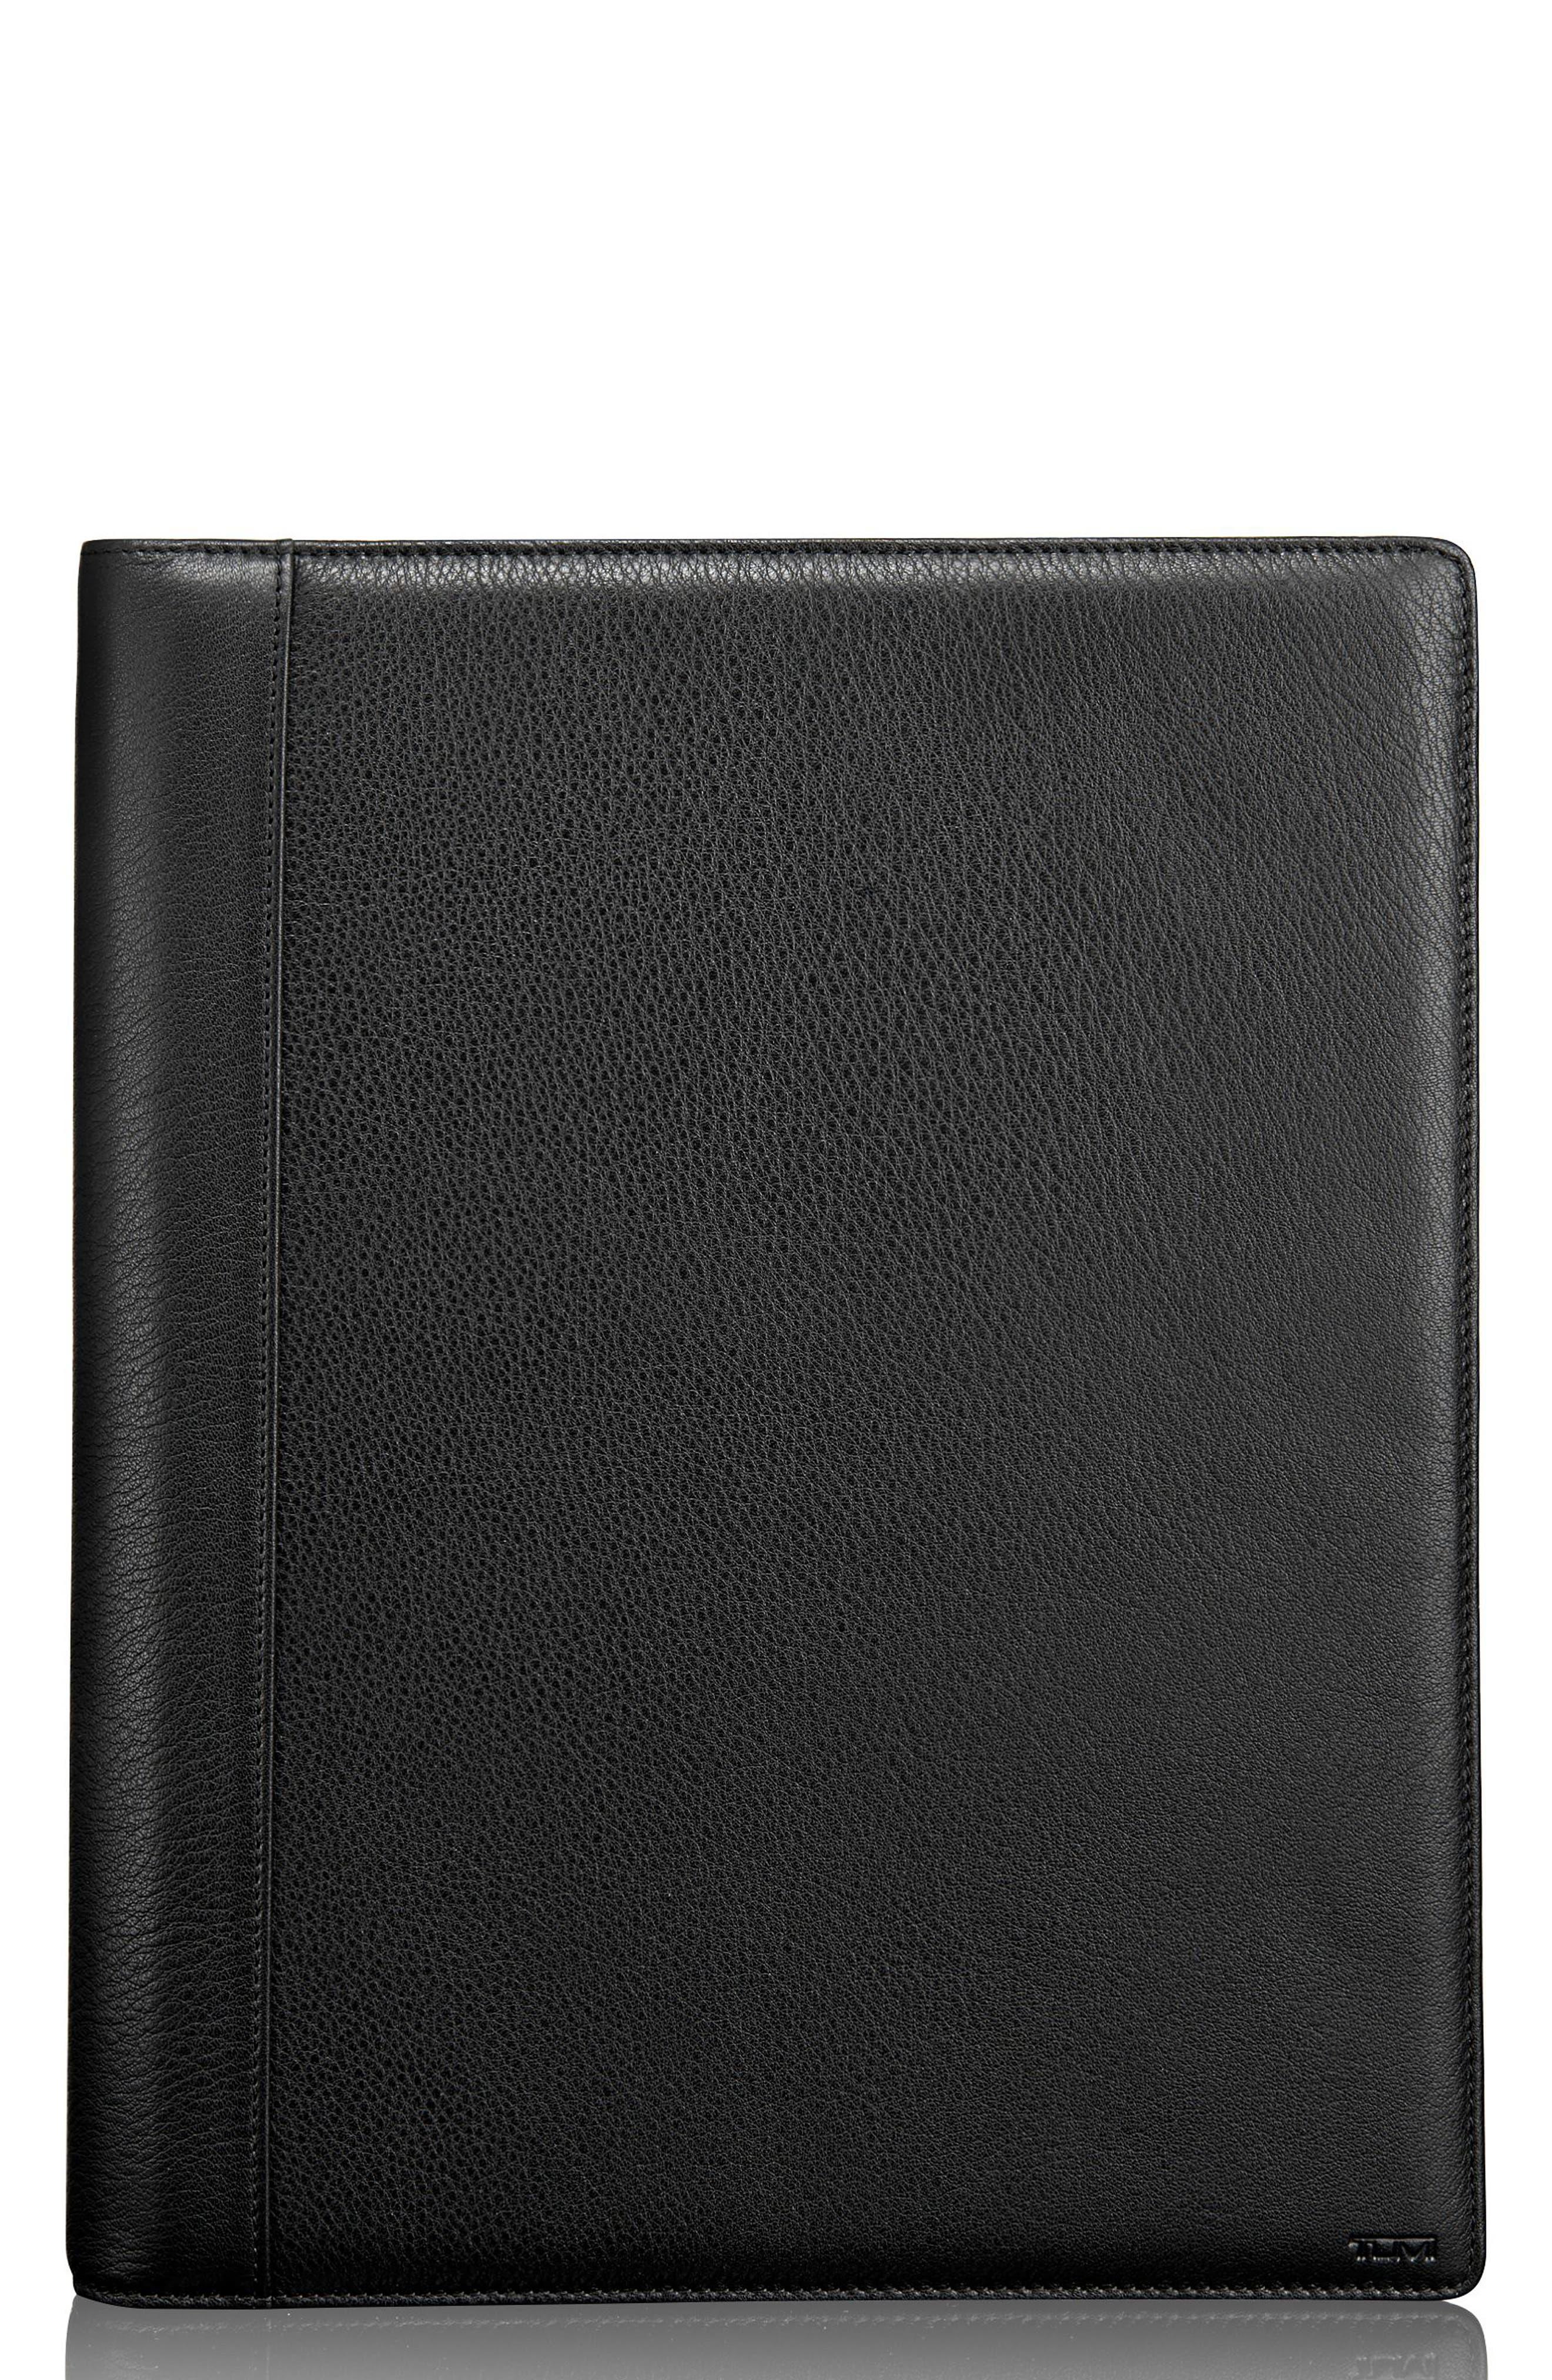 Main Image - Tumi Leather Letter Pad